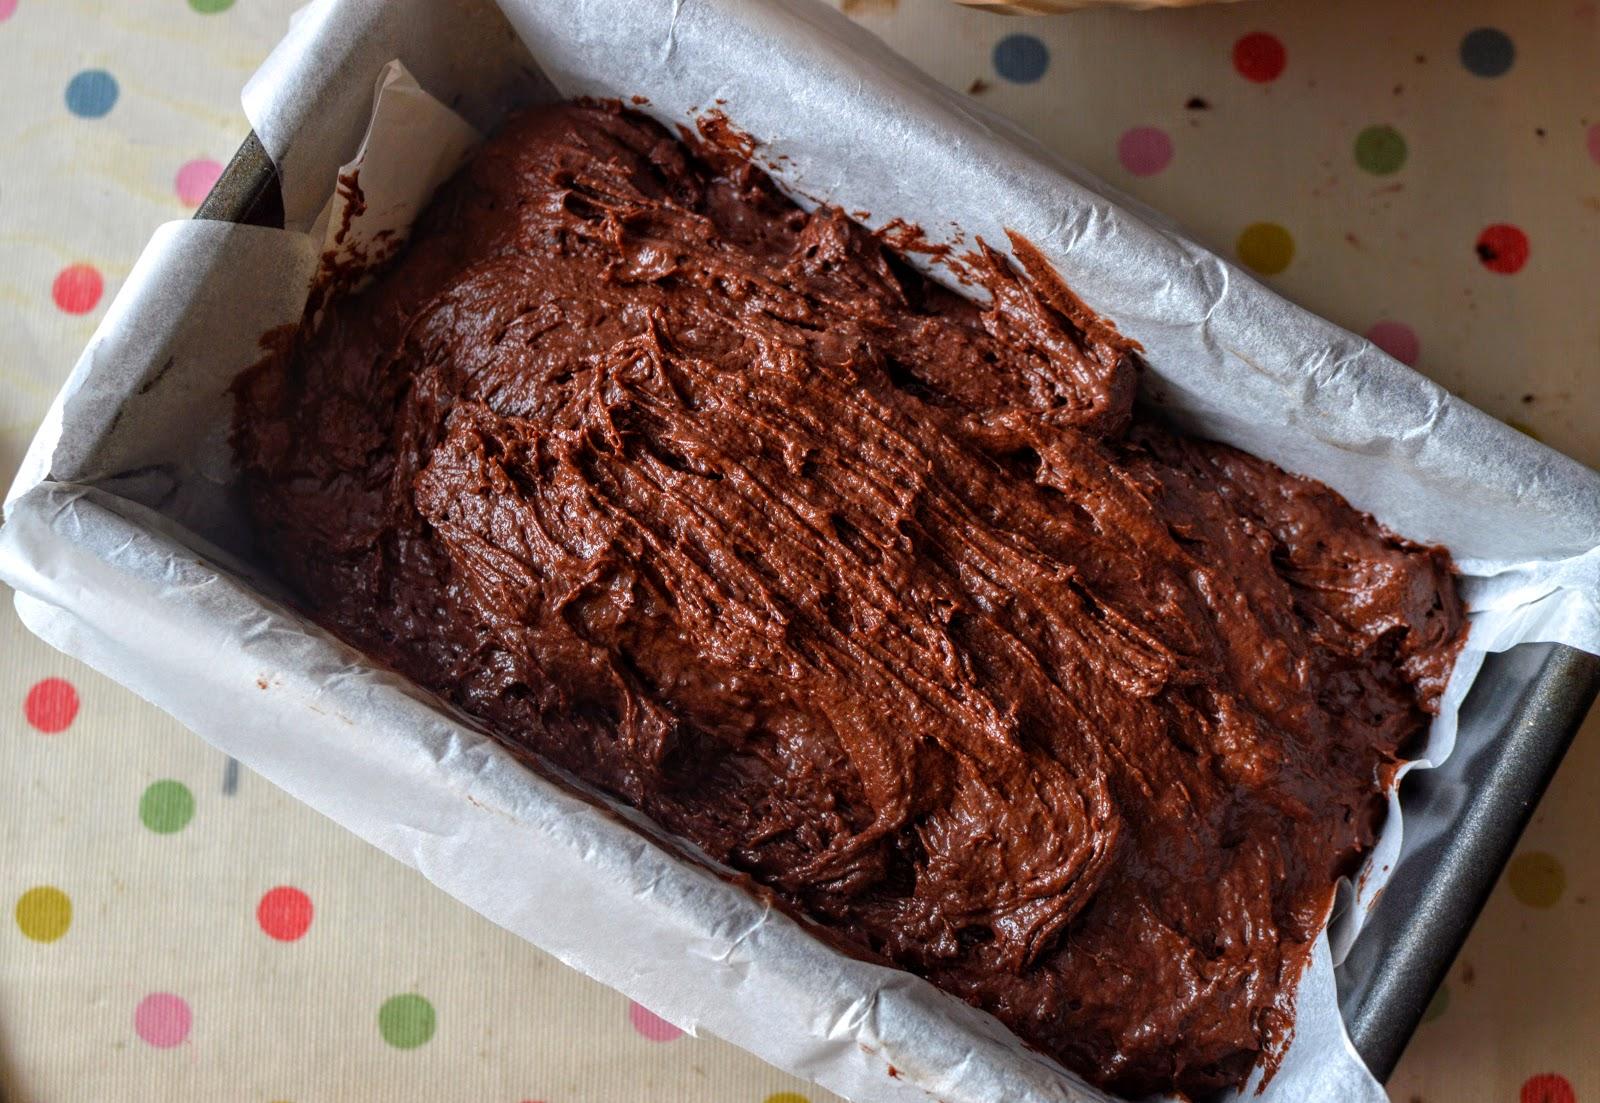 , Fairtrade Fortnight: Chocolate and Banana Cake Recipe #collectivebias #shop #vegan #dairyfree